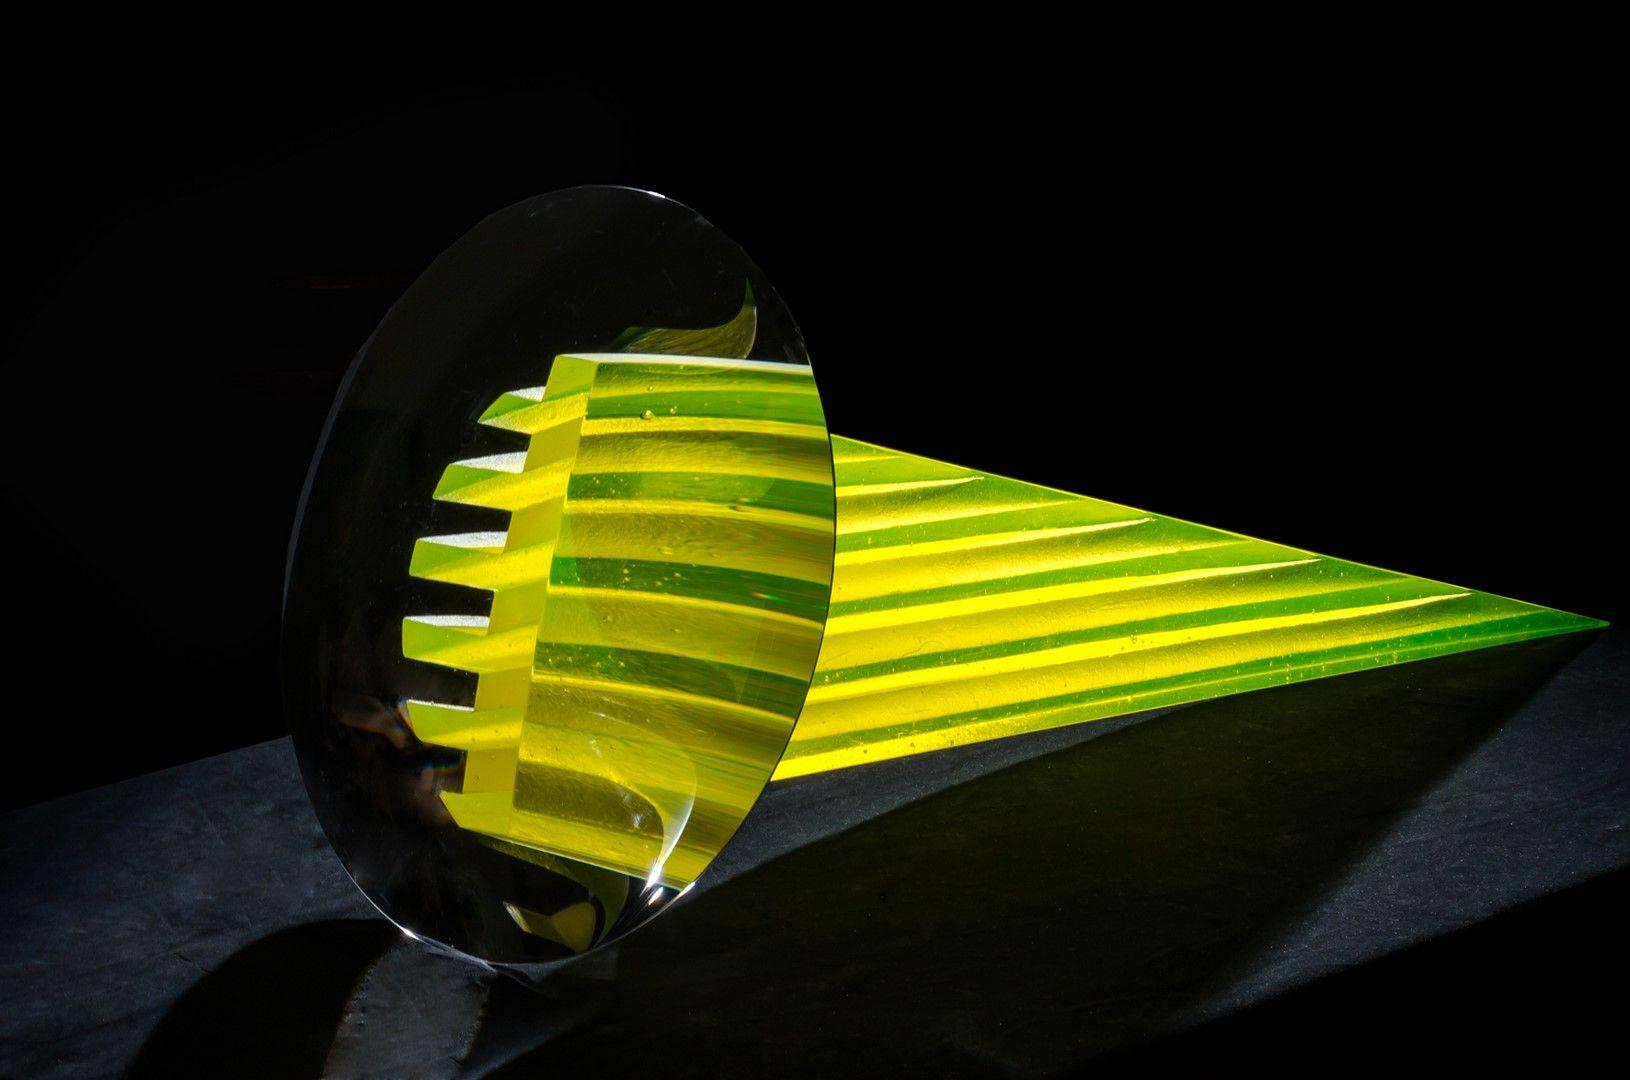 The Best of Glass Sculpture Art - Štepán Pala - Curved Space glass sculpture The Best of Glass Sculpture Art: Štepán Pala The Best of Glass Art   tep  n Pala Curved Space